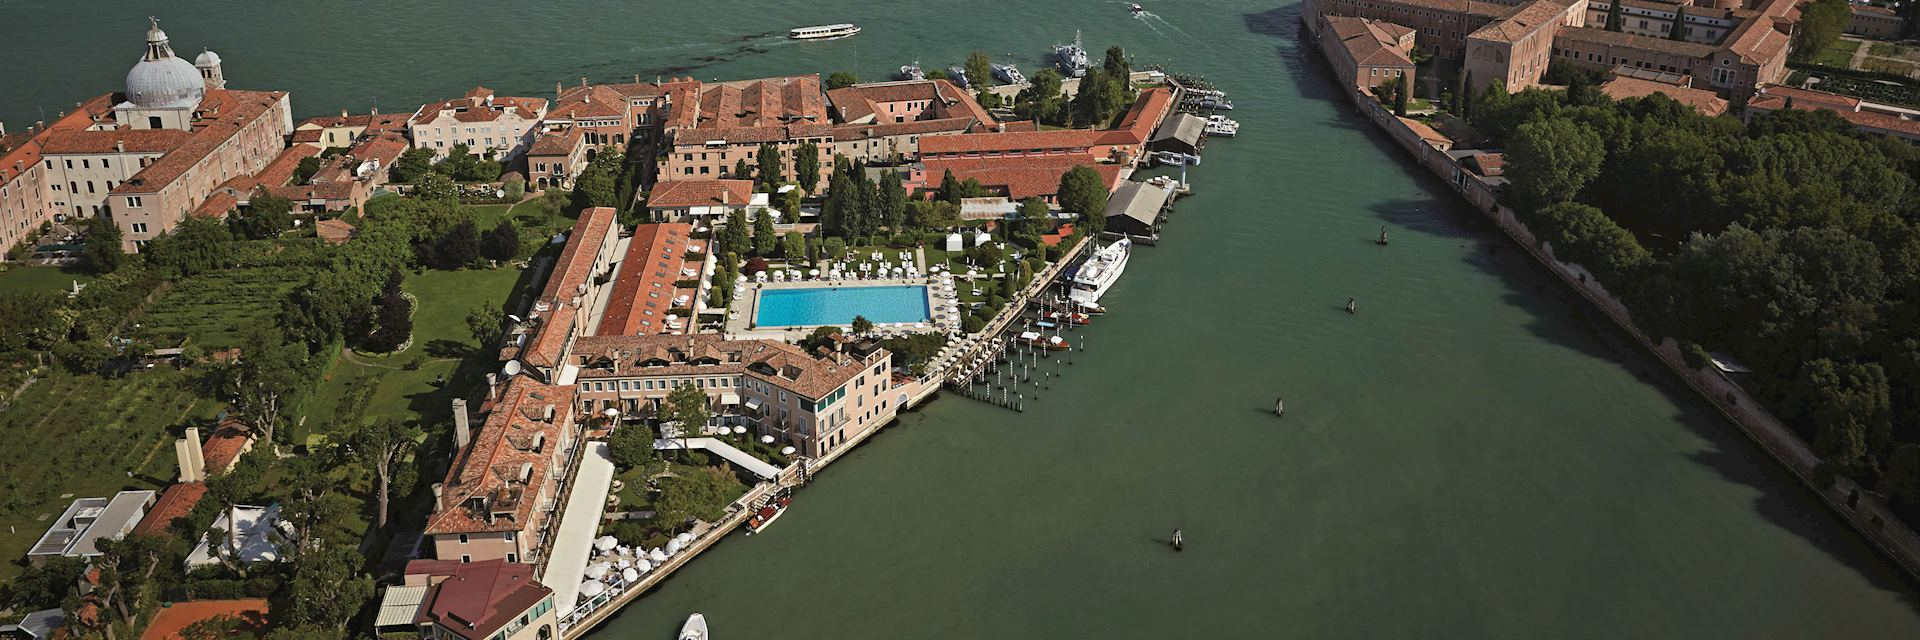 Belmond Hotel Cipriani, Venice